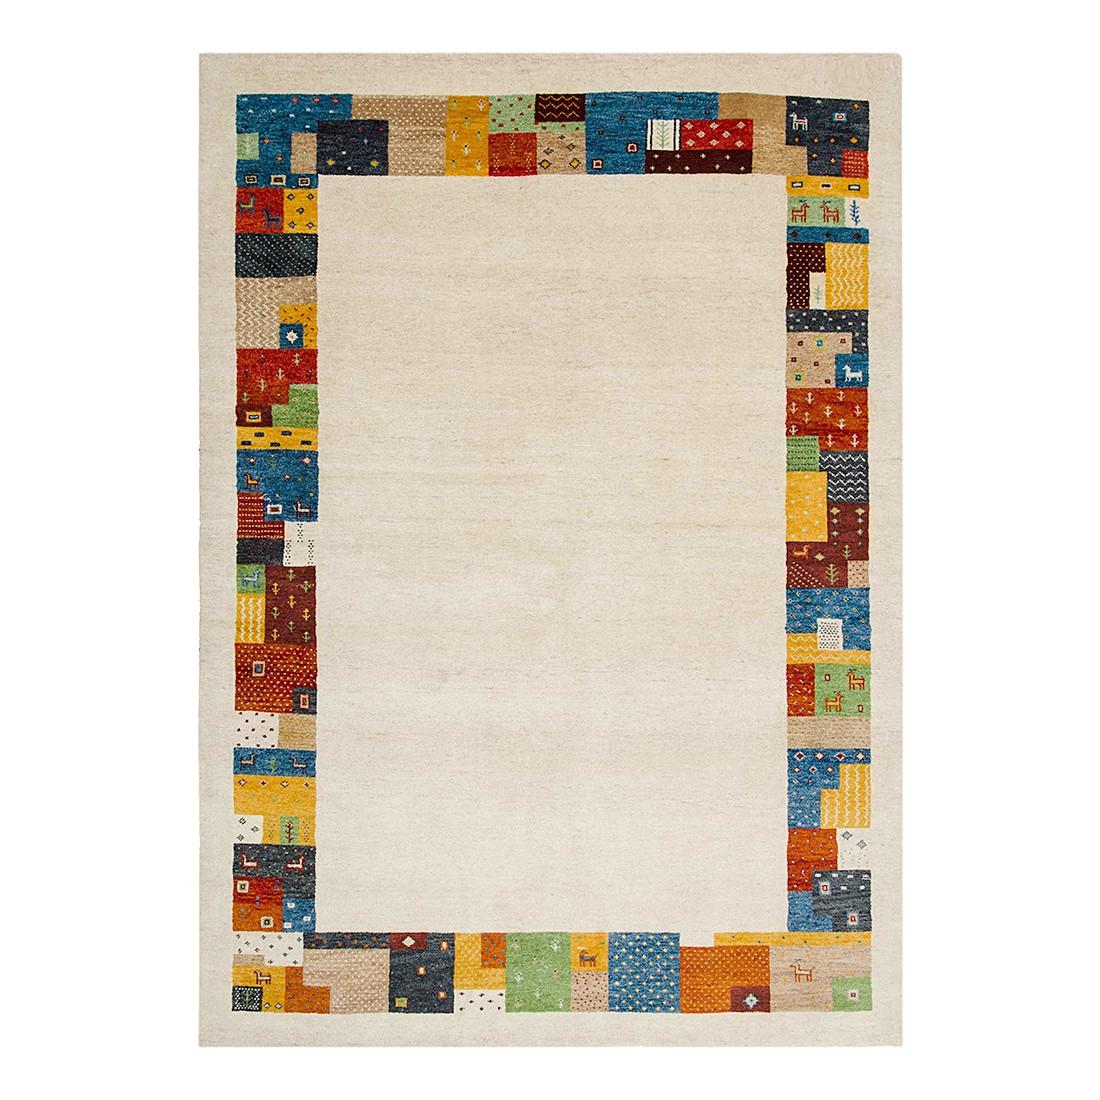 Teppich Torrent Gabbeh - Natur - Maße: 240 x 170 cm, Parwis